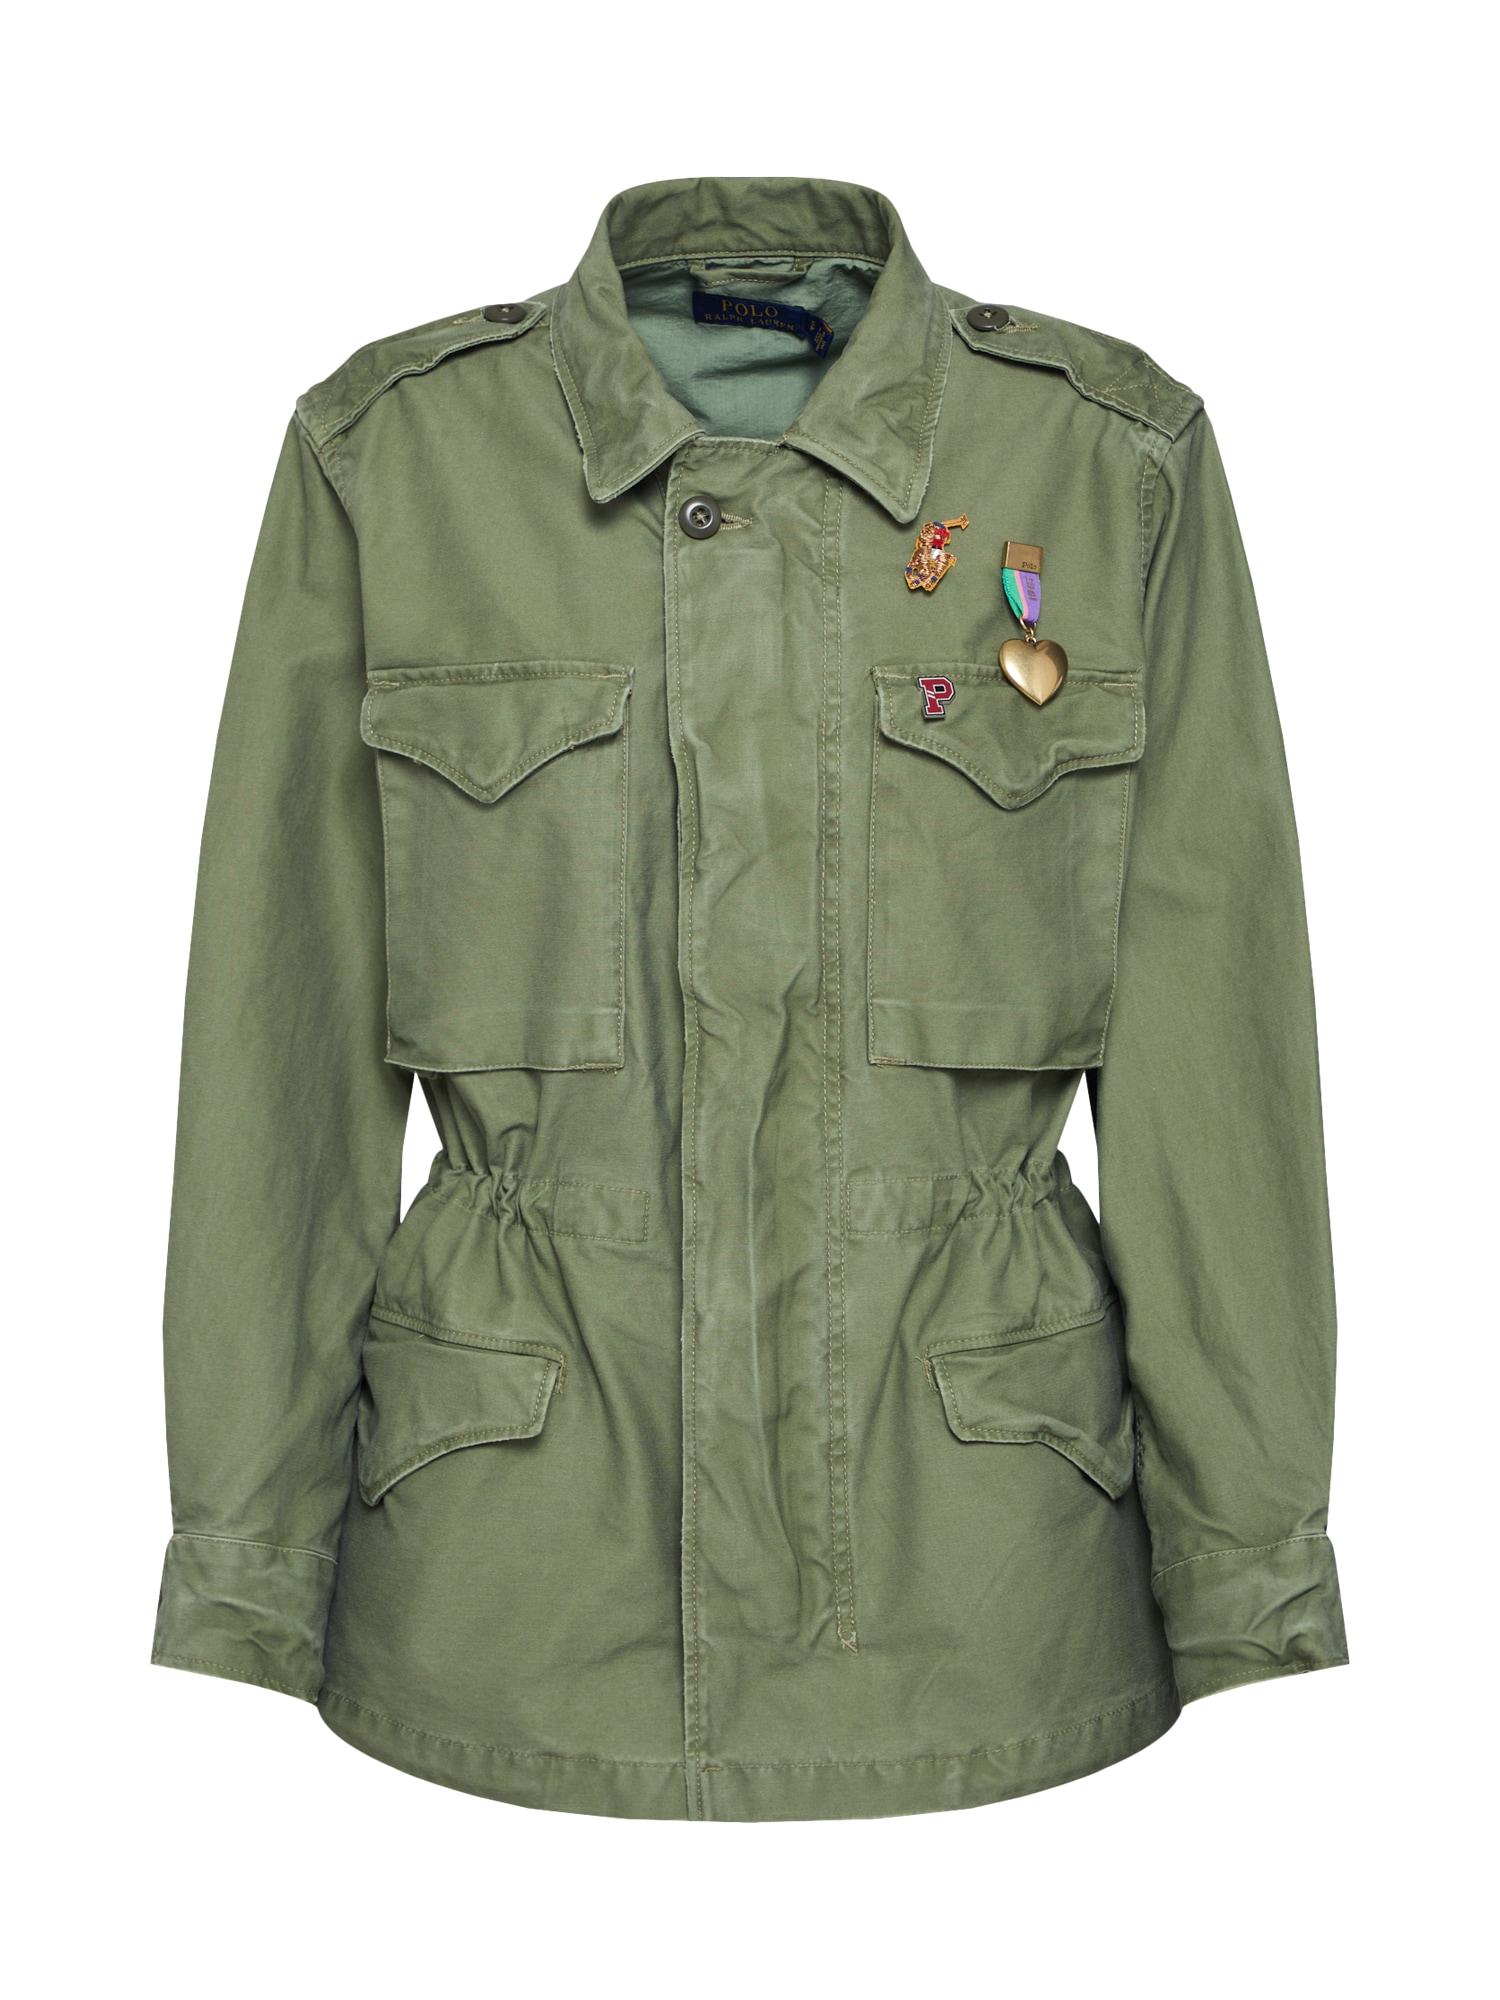 Přechodná bunda SKN MTRY JKT-JACKET khaki POLO RALPH LAUREN